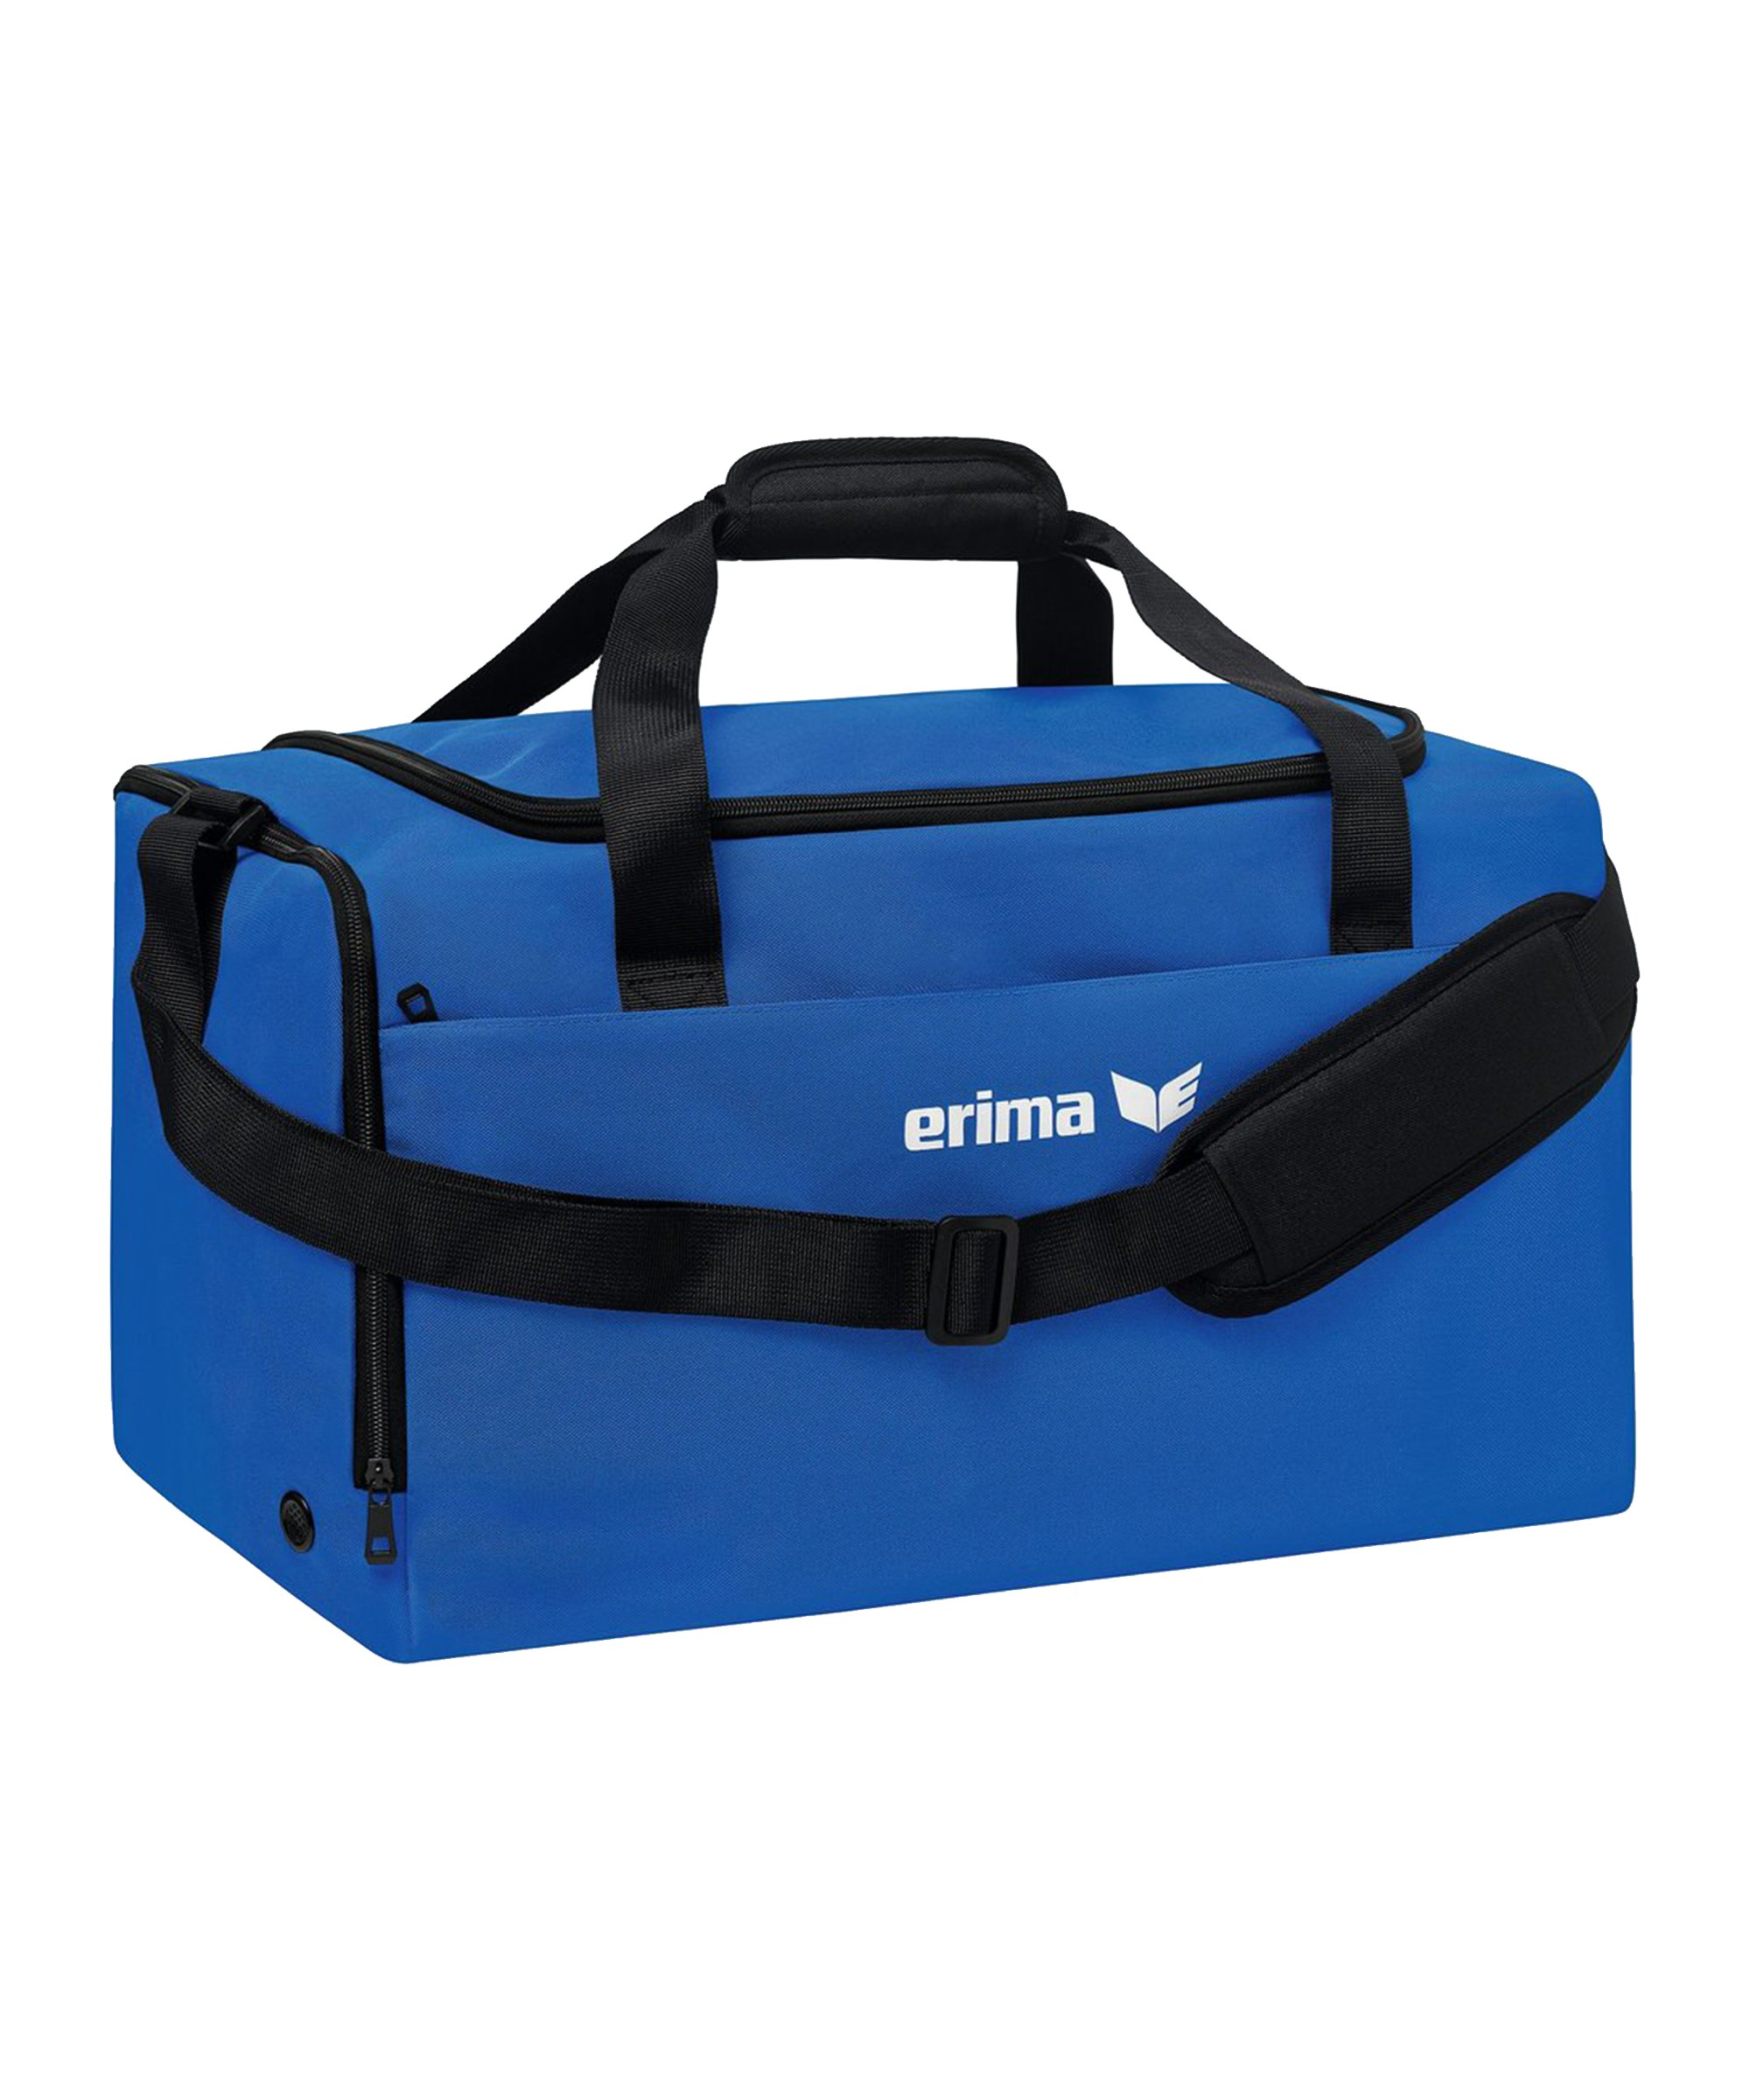 Erima TEAM Sporttasche Gr.S Blau - blau